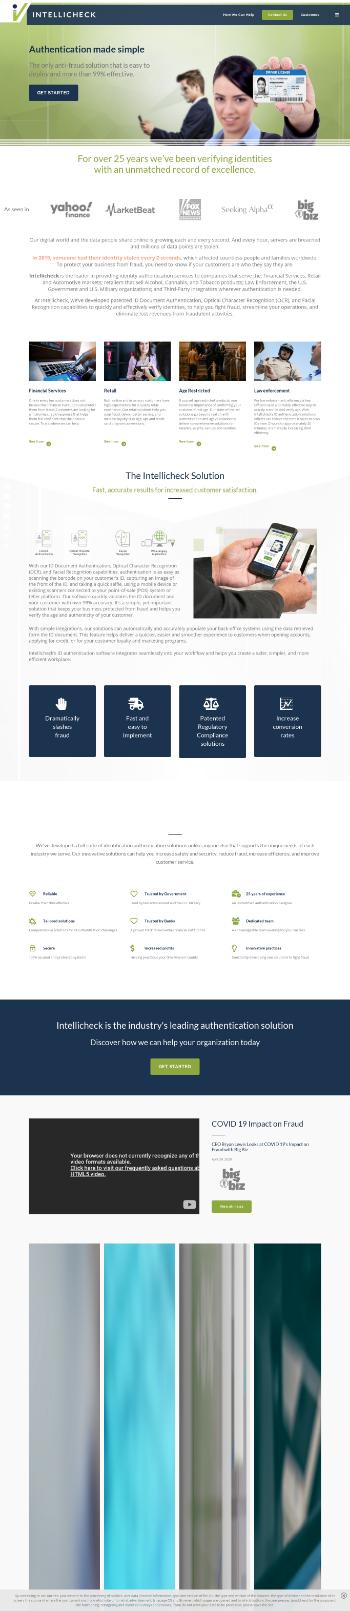 Intellicheck, Inc. Website Screenshot